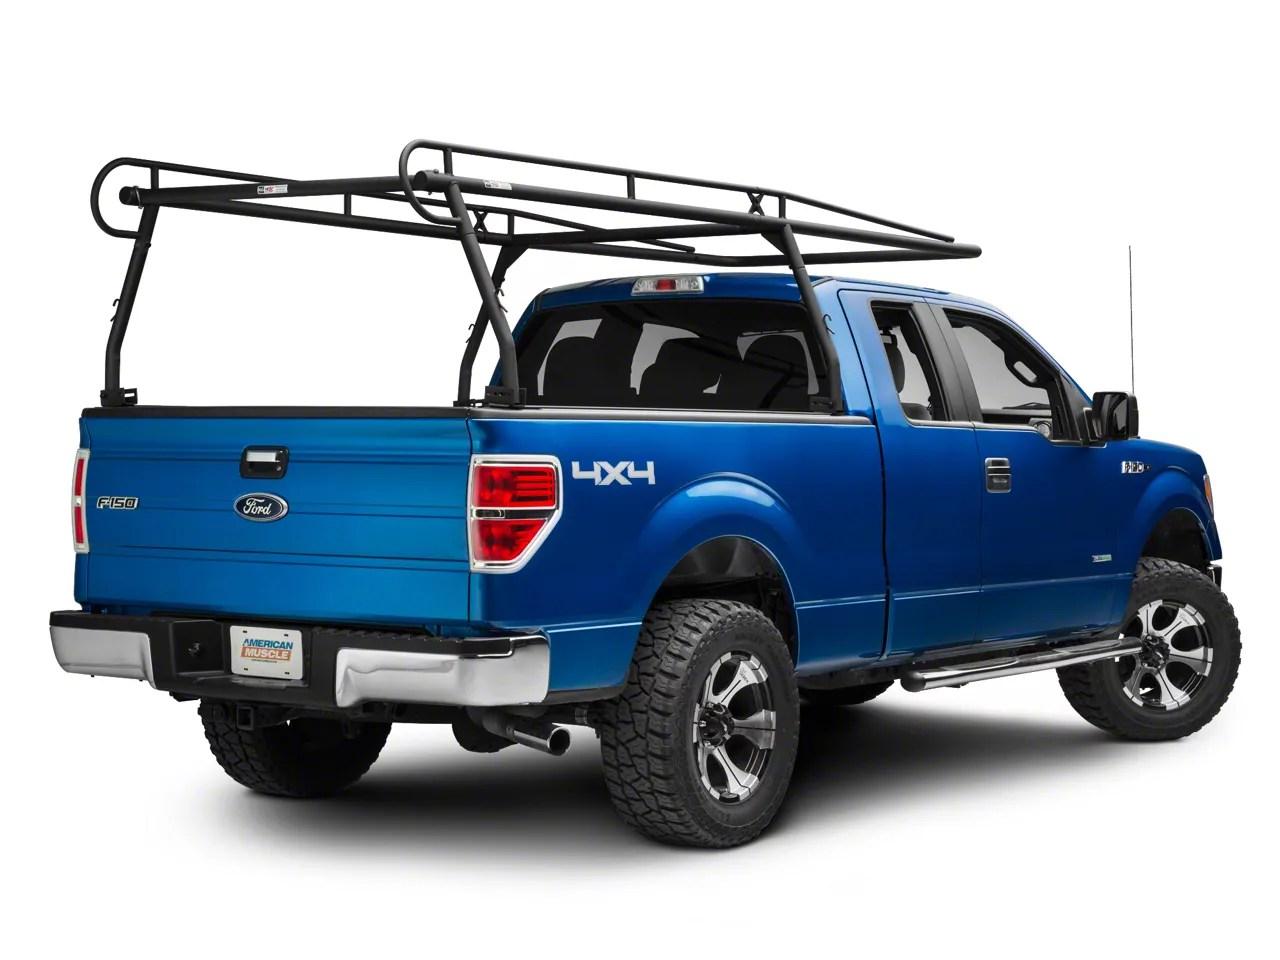 Westin F 150 Hdx Overhead Truck Rack Textured Black